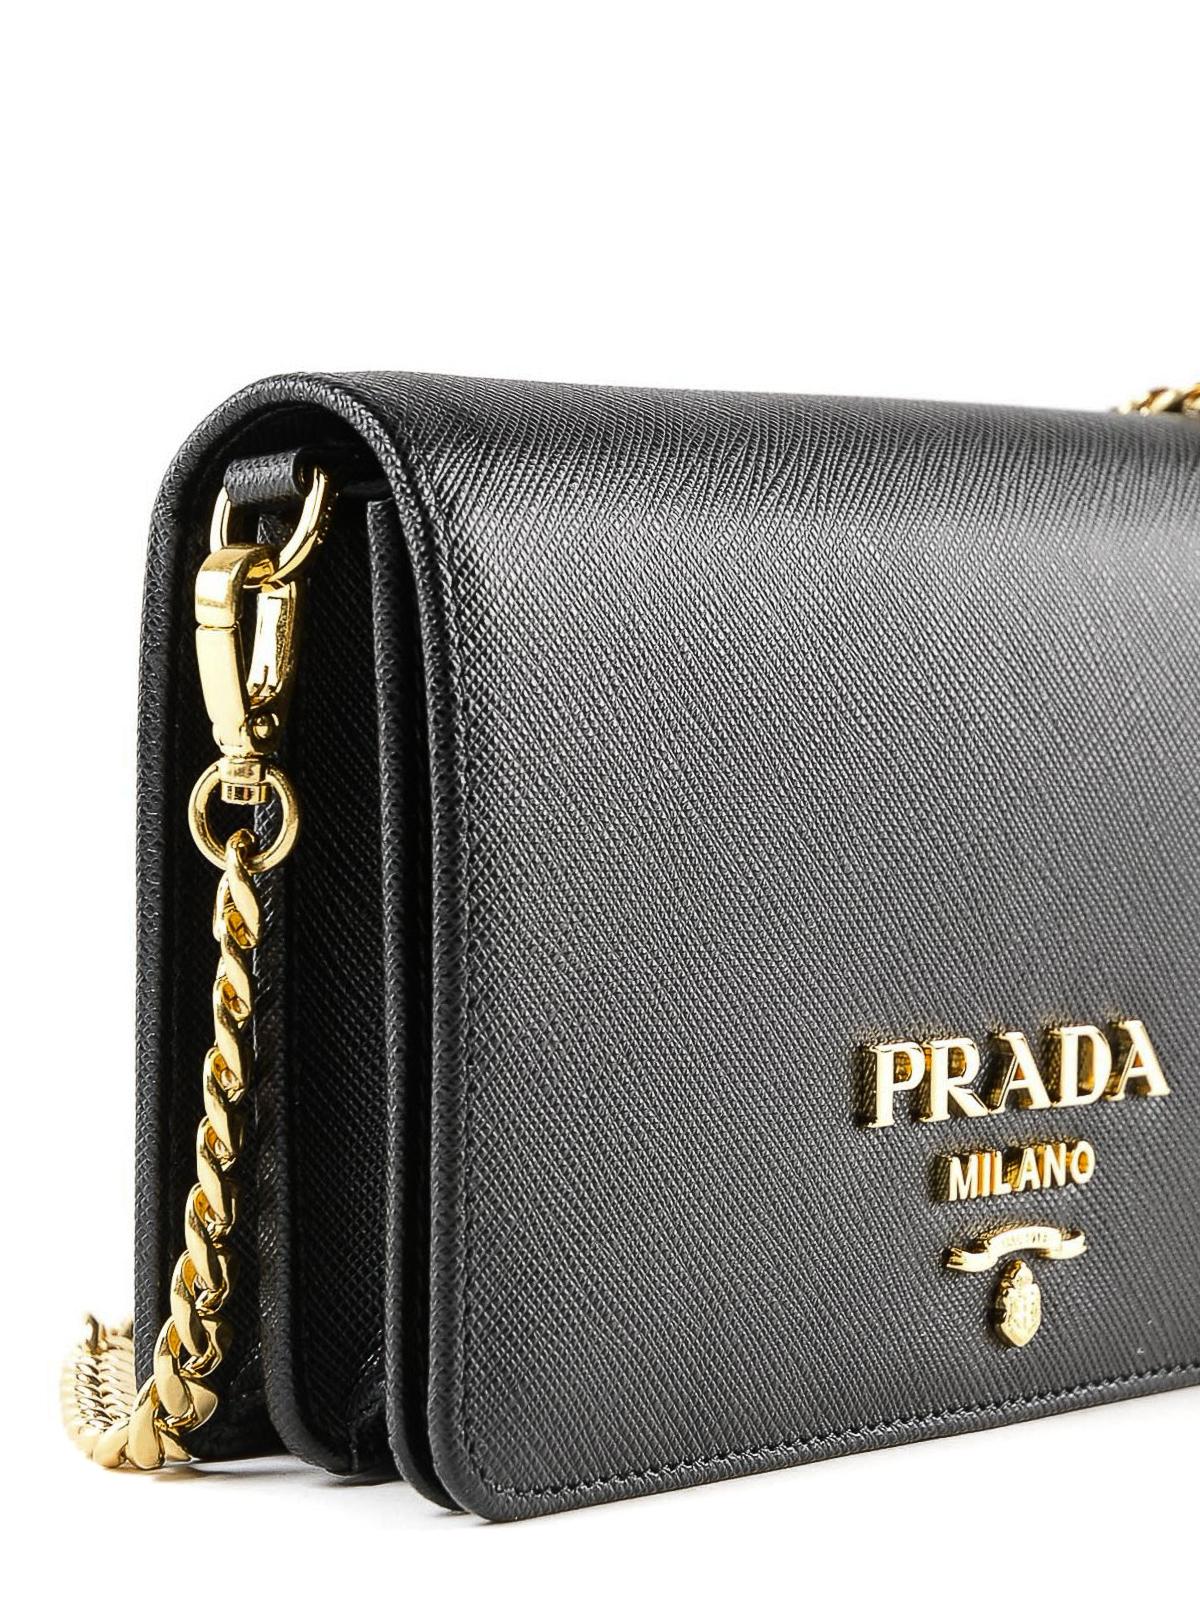 780daf0e24ca Prada - Saffiano leather wallet clutch - clutches - 1BP006NZV VCOW 002